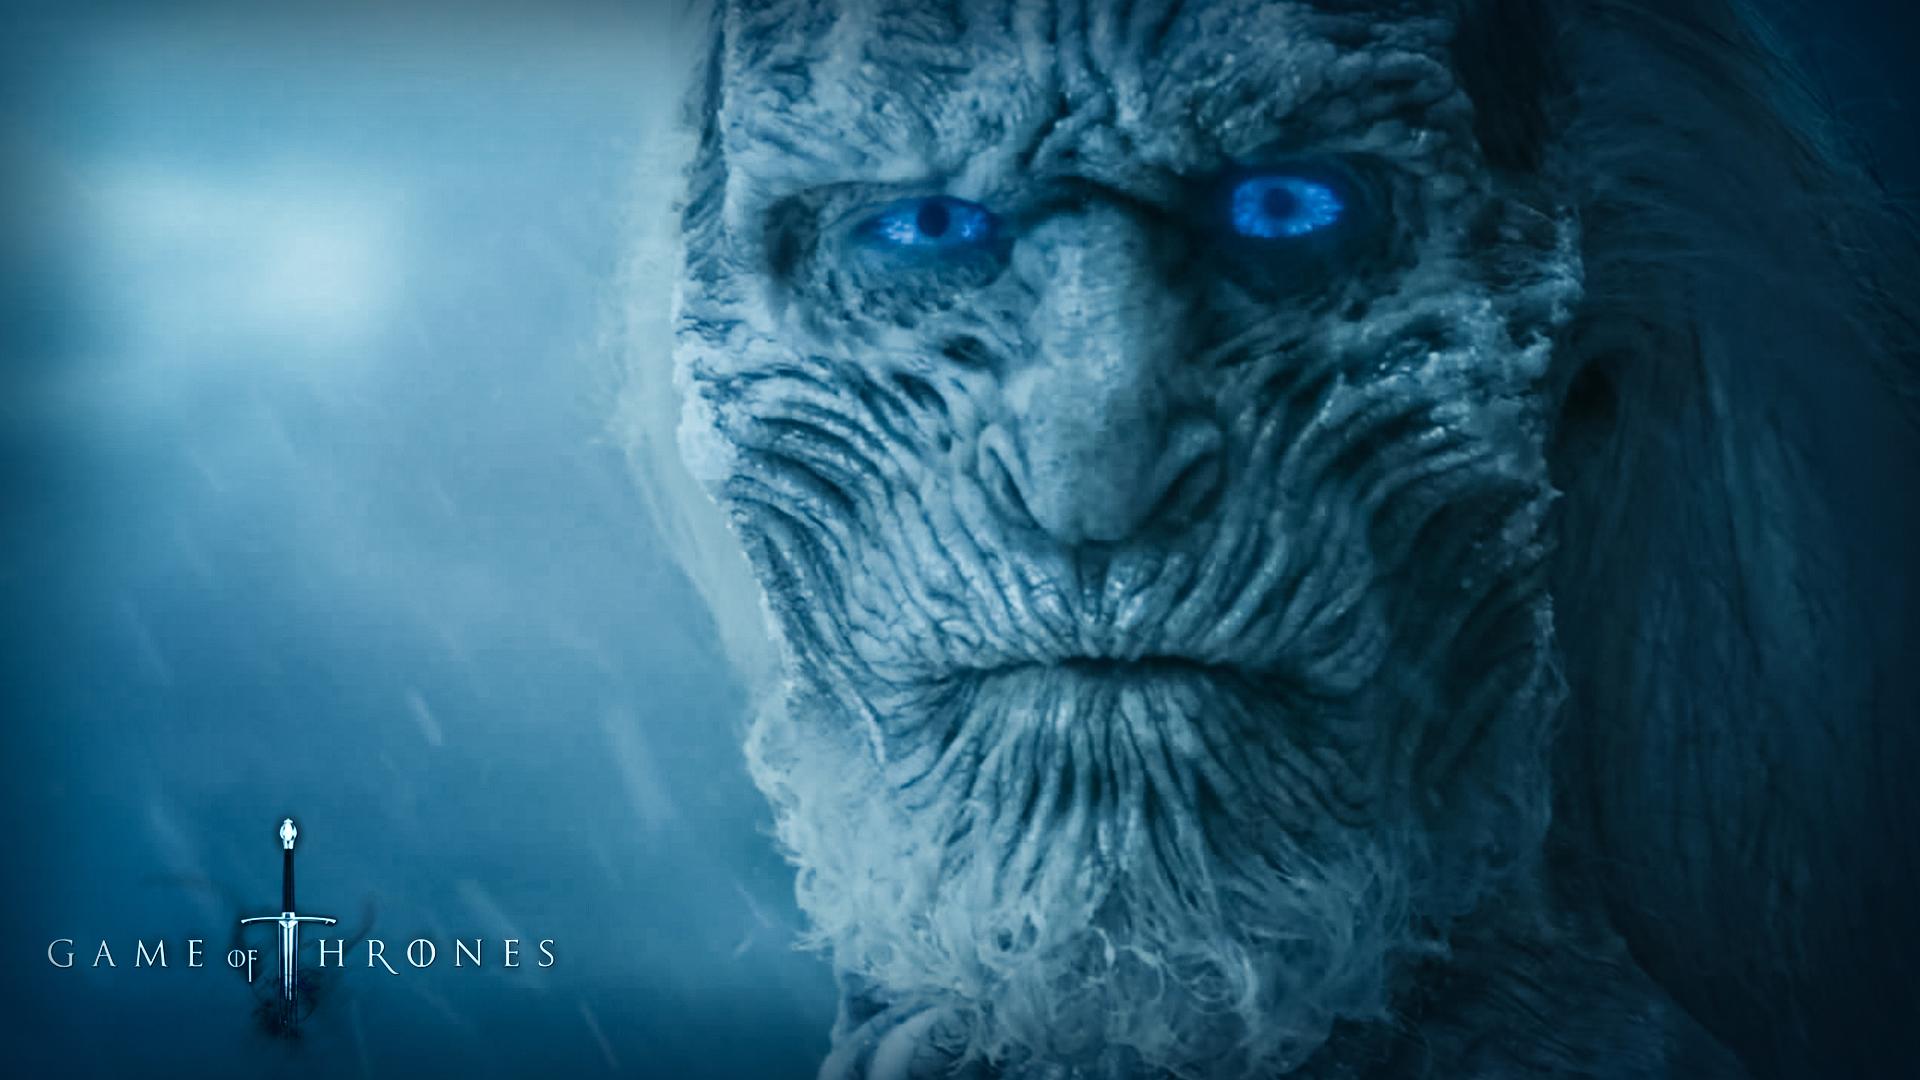 Game Of Thrones Season 8 Countdown - HD Wallpaper